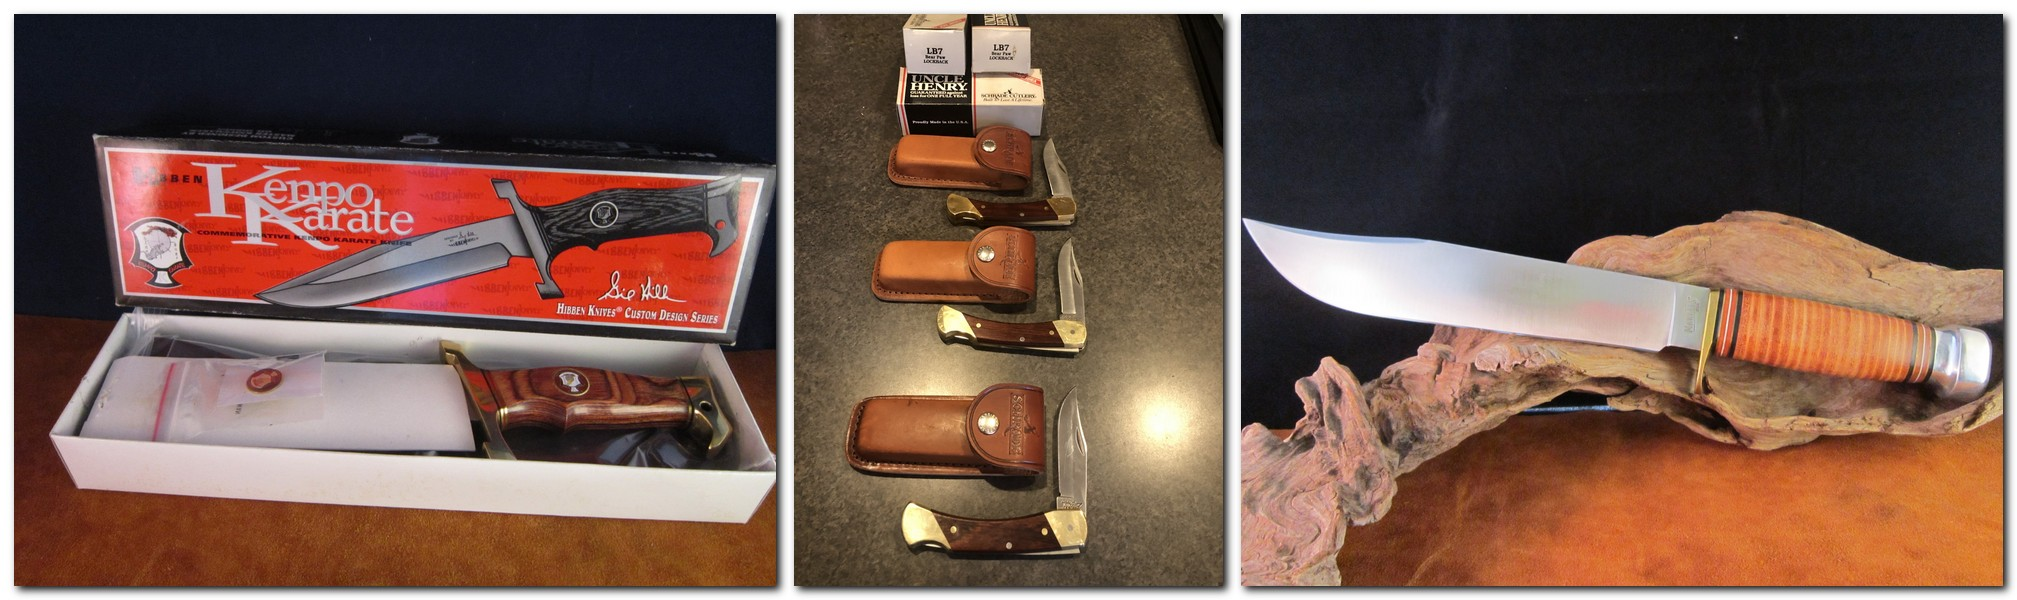 we-buy-knives.jpg